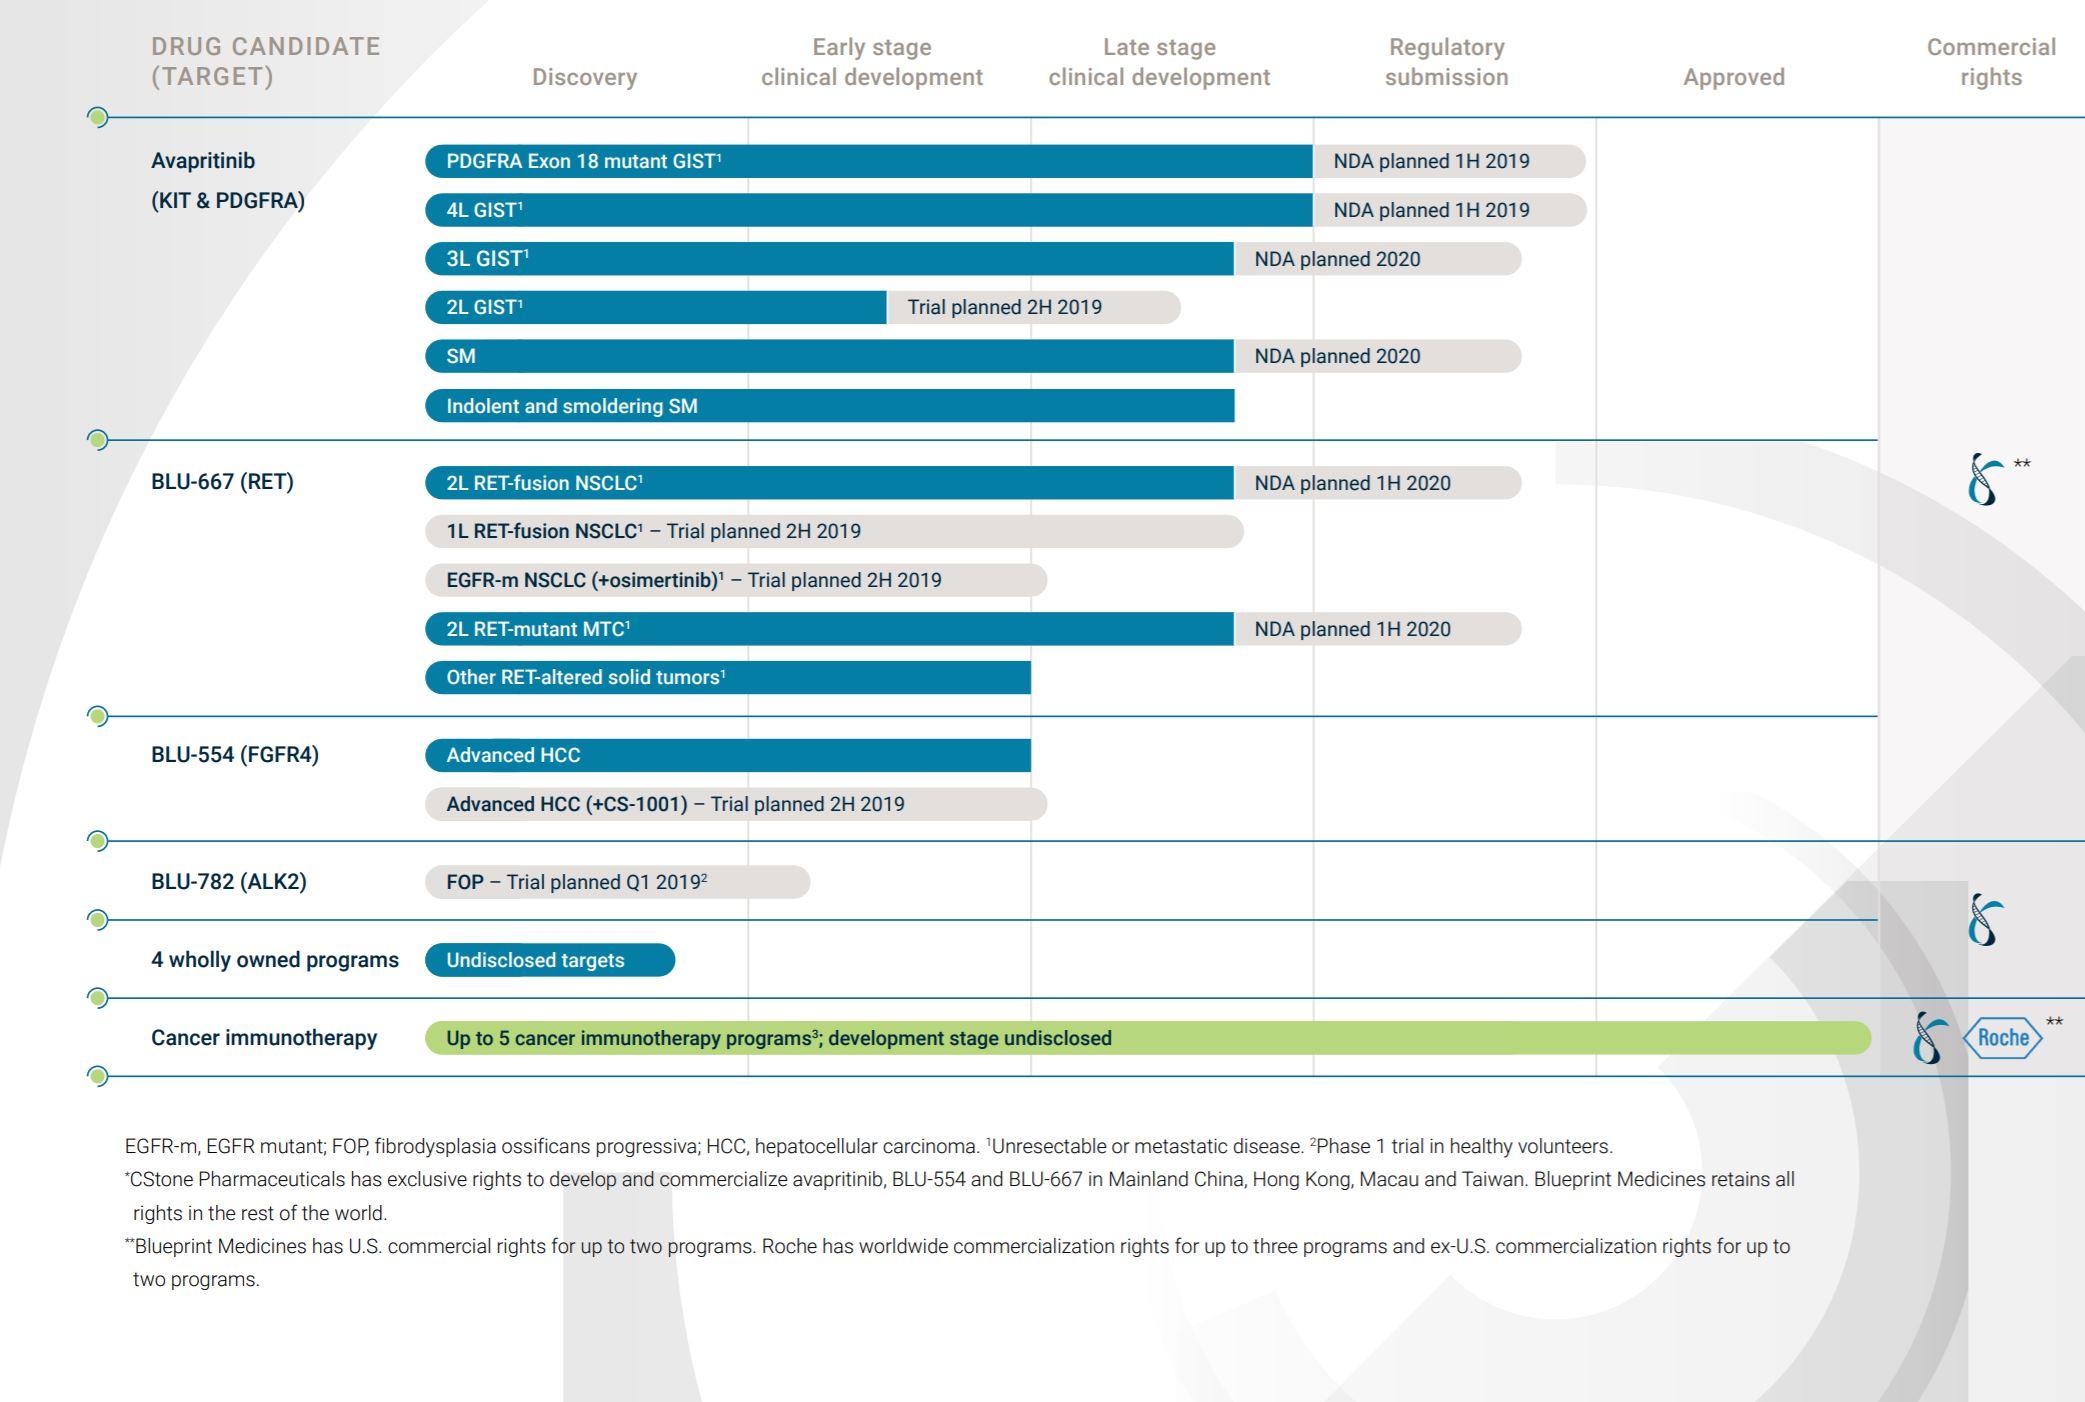 blueprint medicine bpmc pipeline